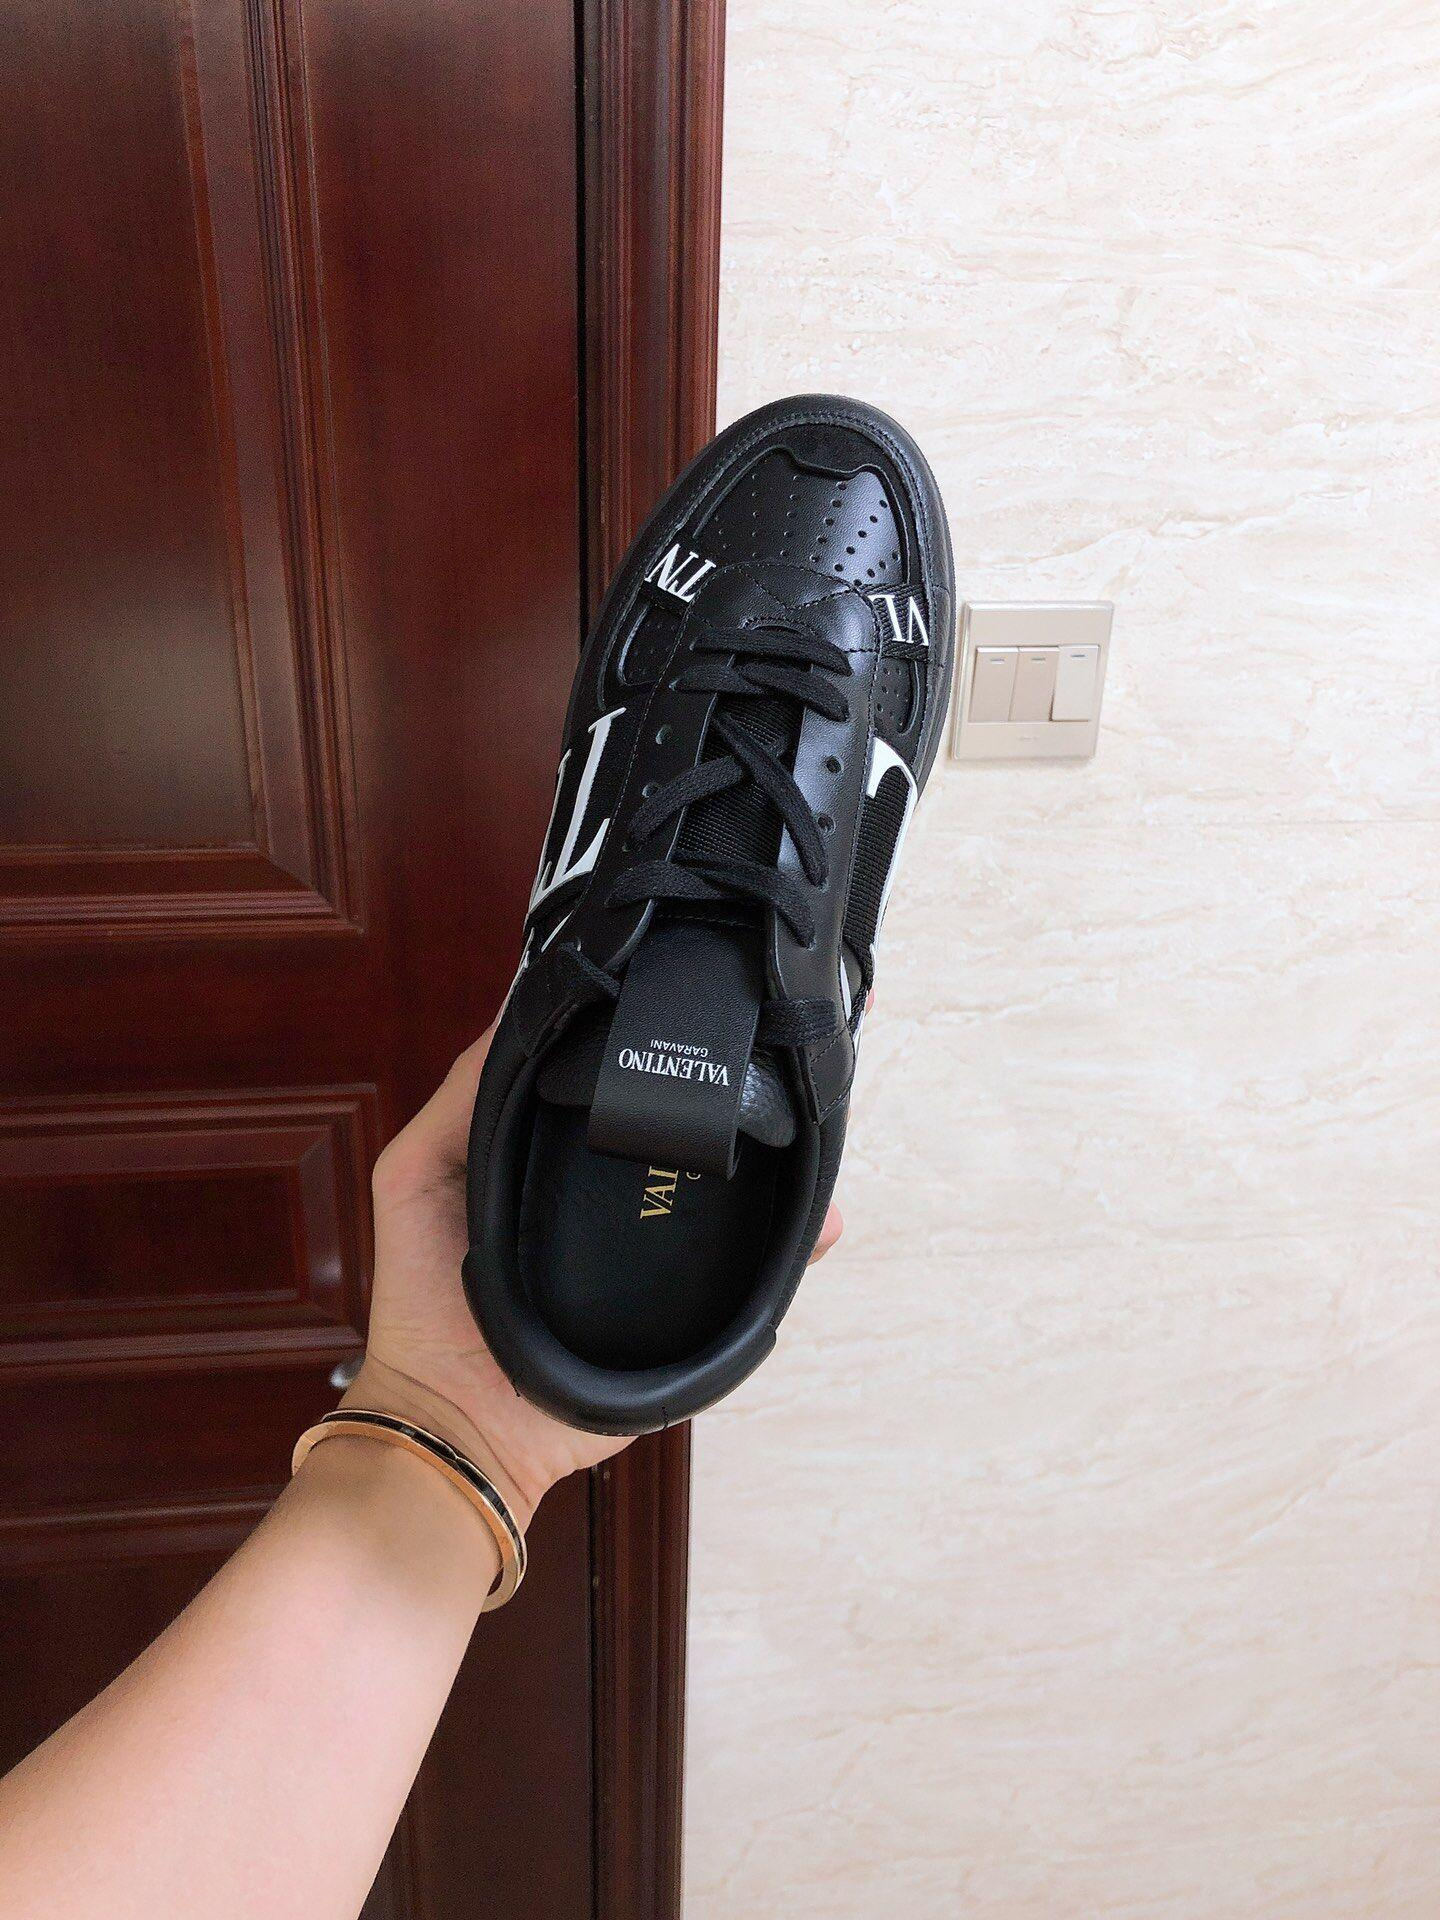 GARAVANI CALFSKIN VL7N SNEAKER WITH BANDS           shoes snekaer  8